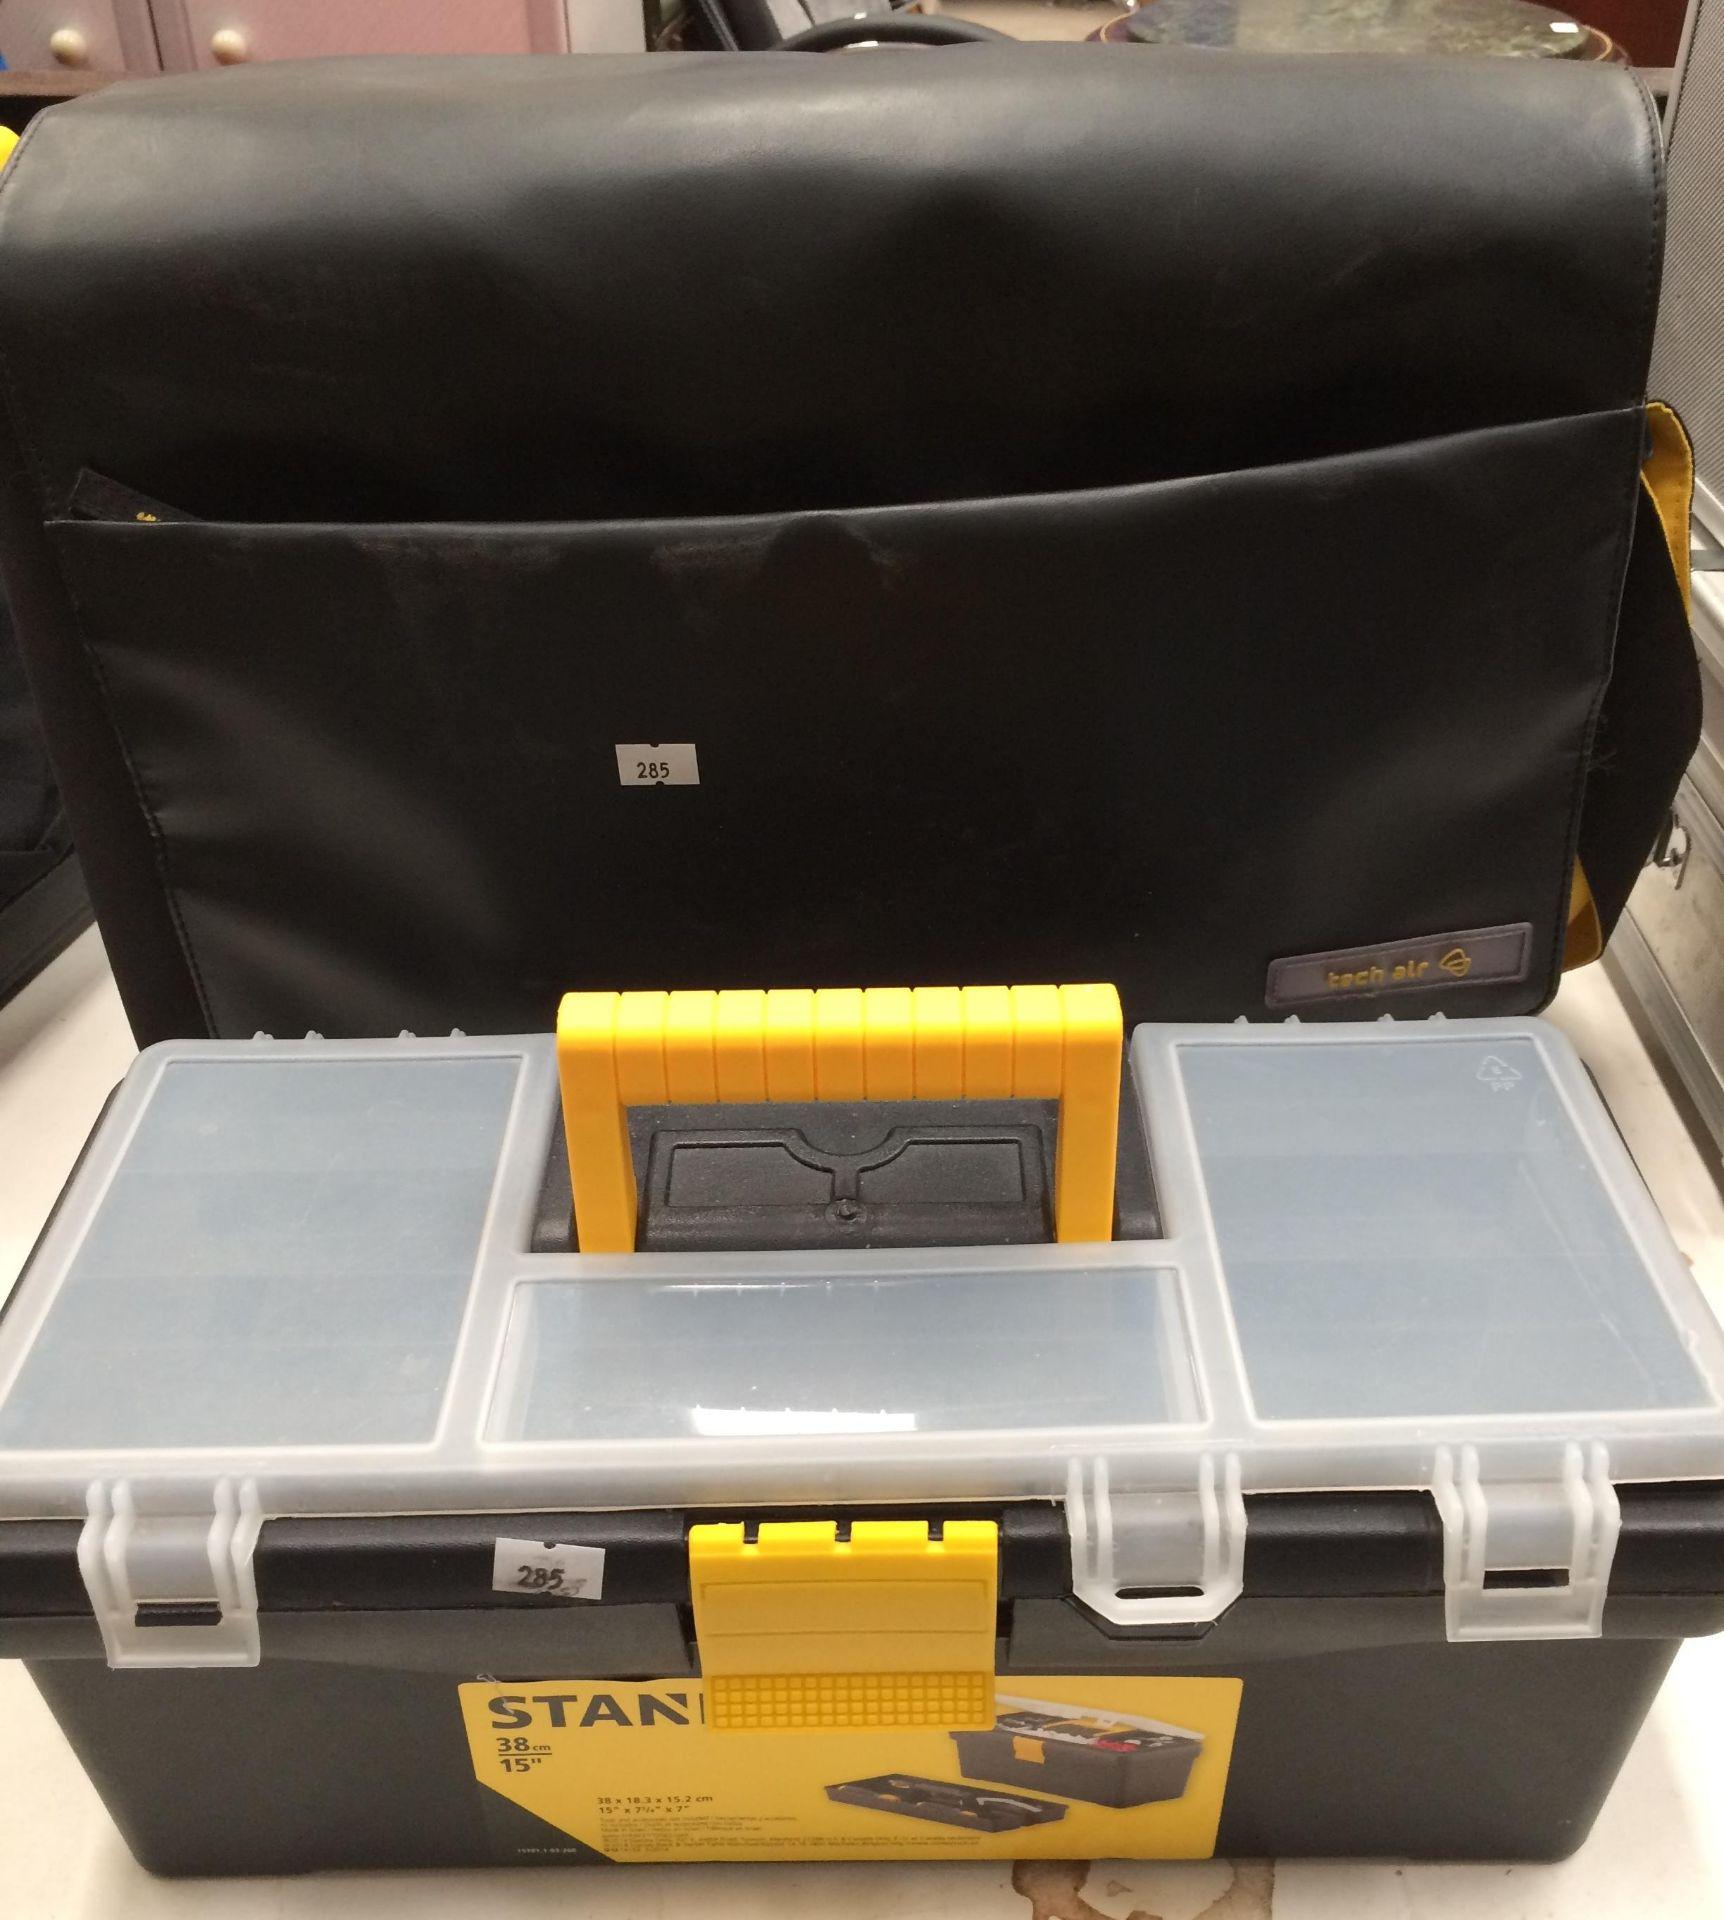 Stanley 38cm plastic tool box and a Tech Air shoulder bag